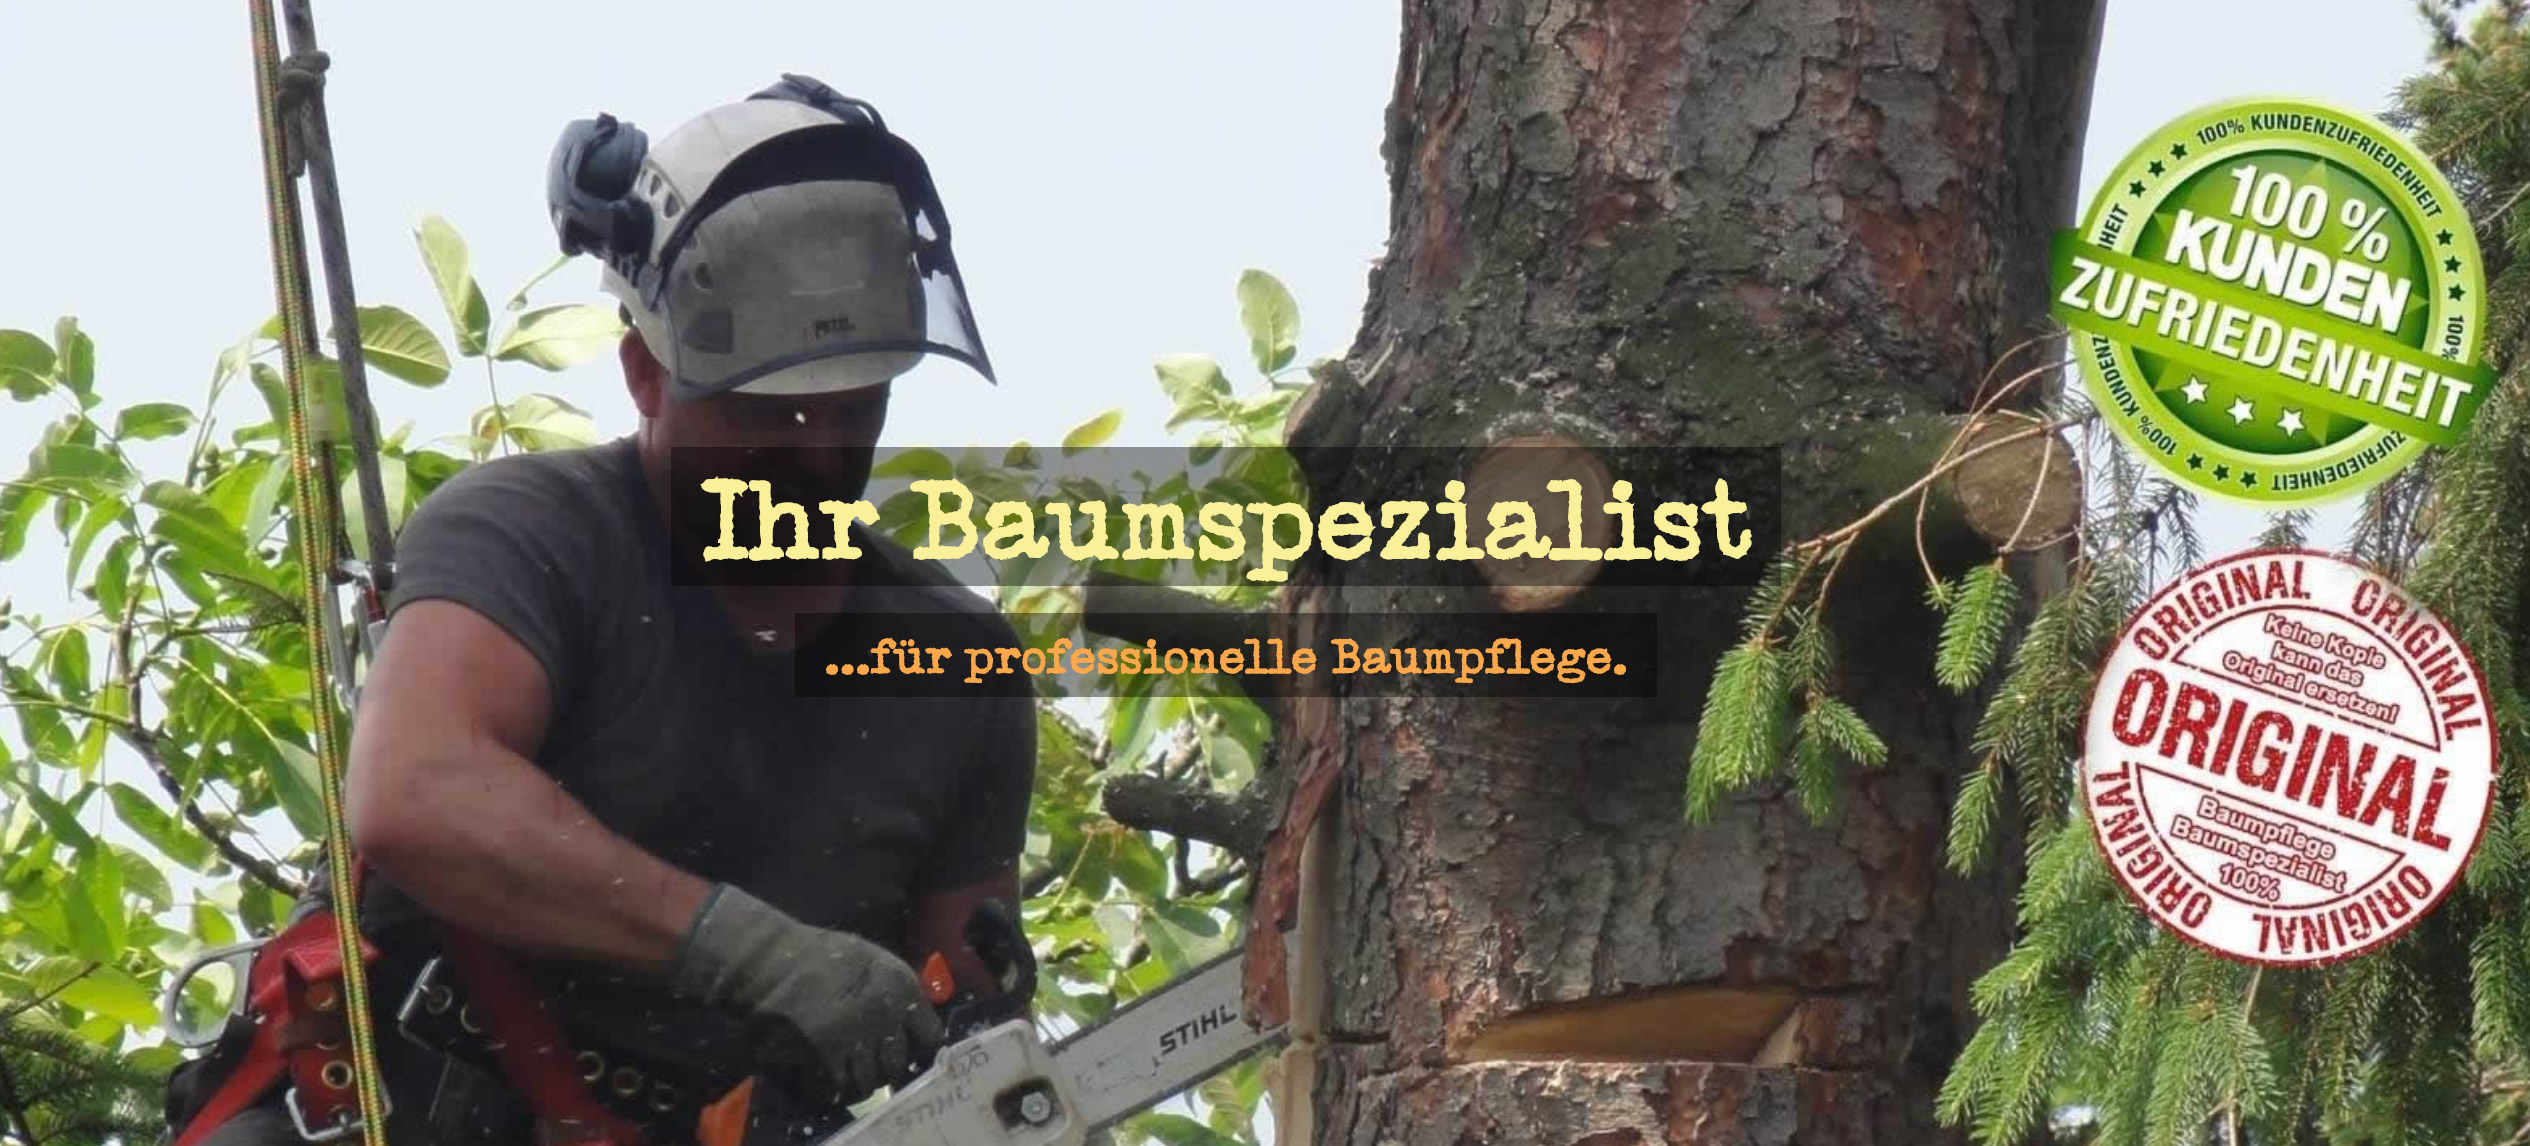 Baumpflege Kornwestheim | 🥇 Stefan Reuschling ➤ Baumspezialist & ✓ Baumfällungen